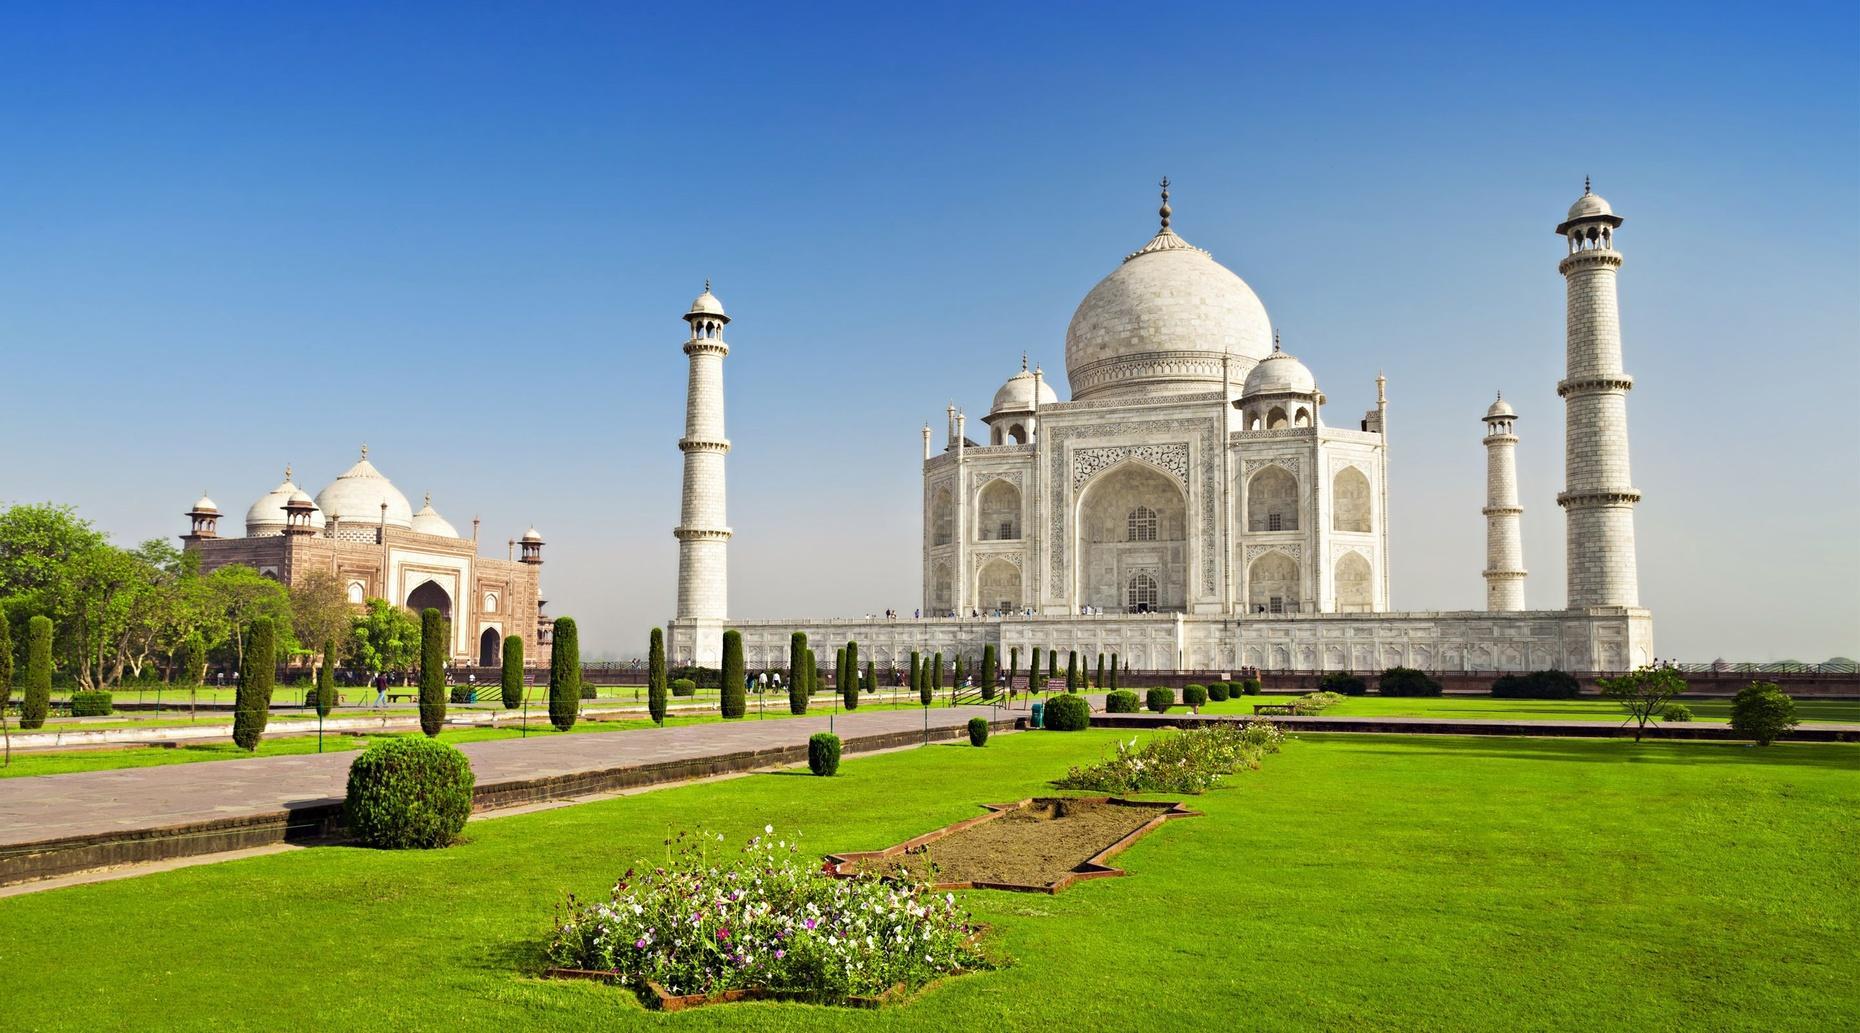 Train Ride to the Taj Mahal & Back from Delhi